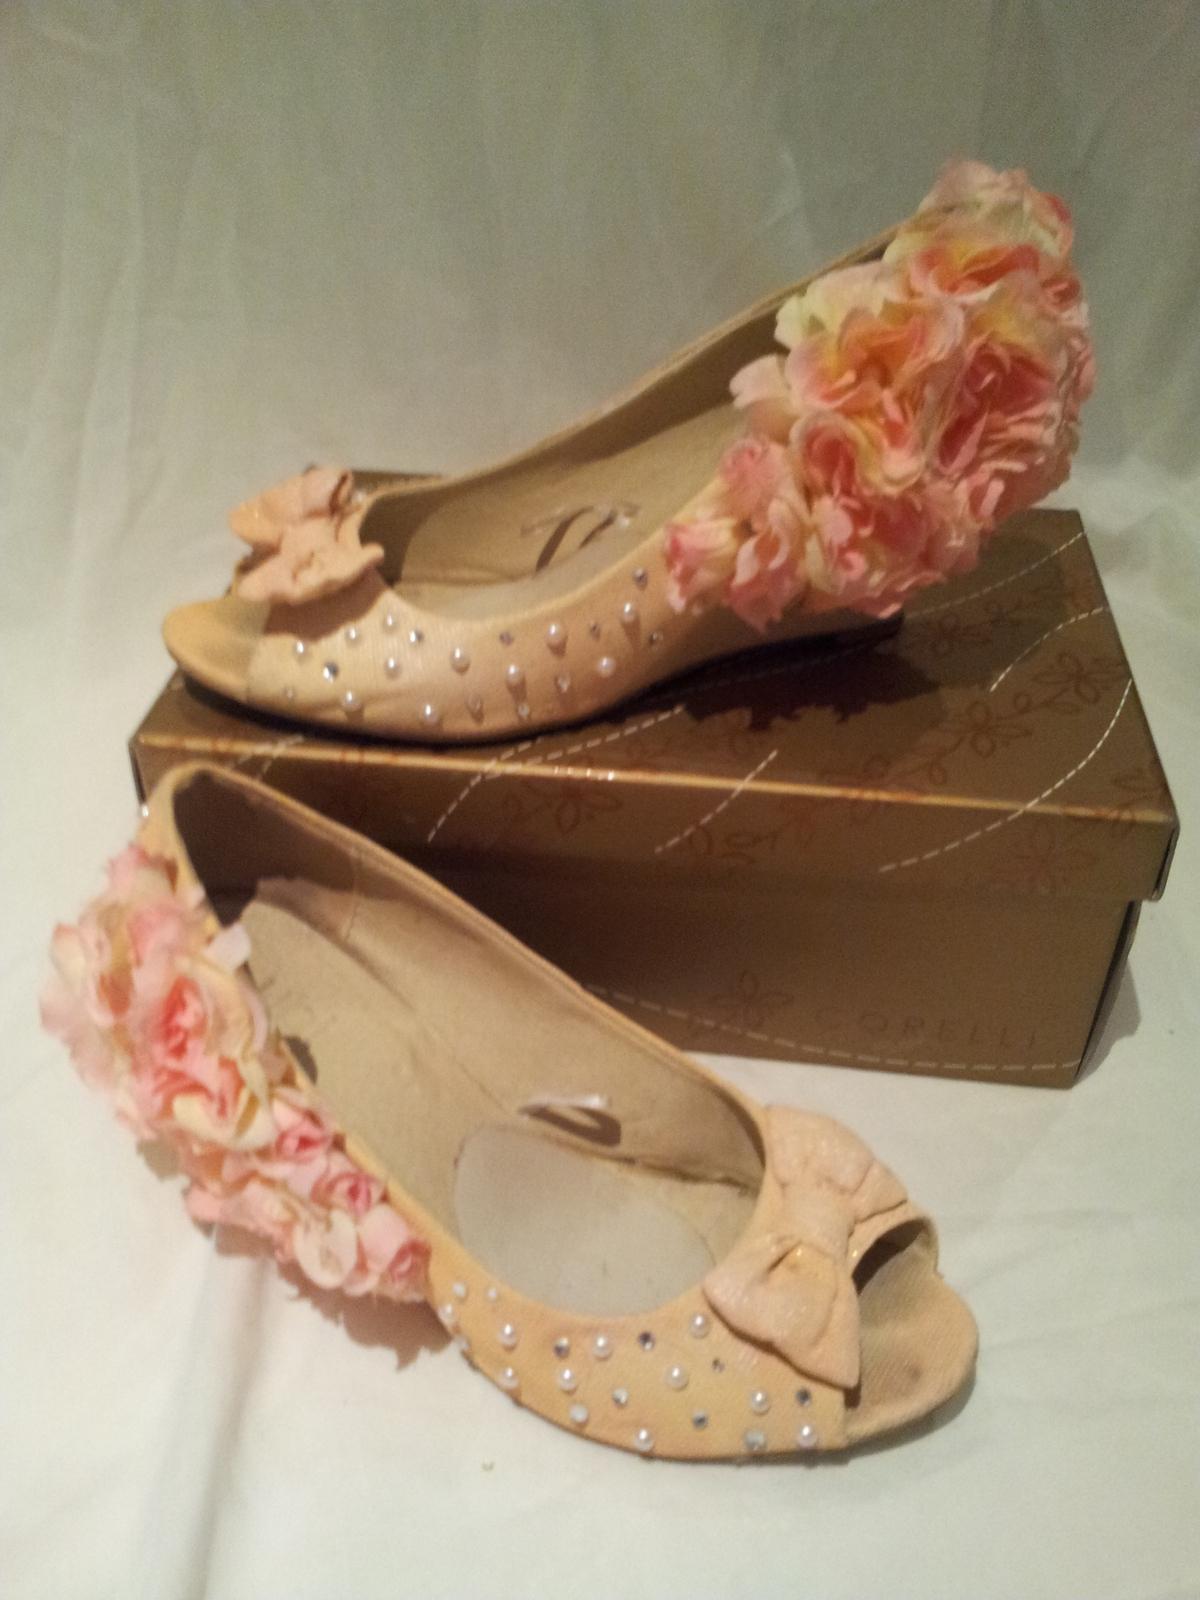 christian louboutin heels burlesque - Obsidian Wellness Centre